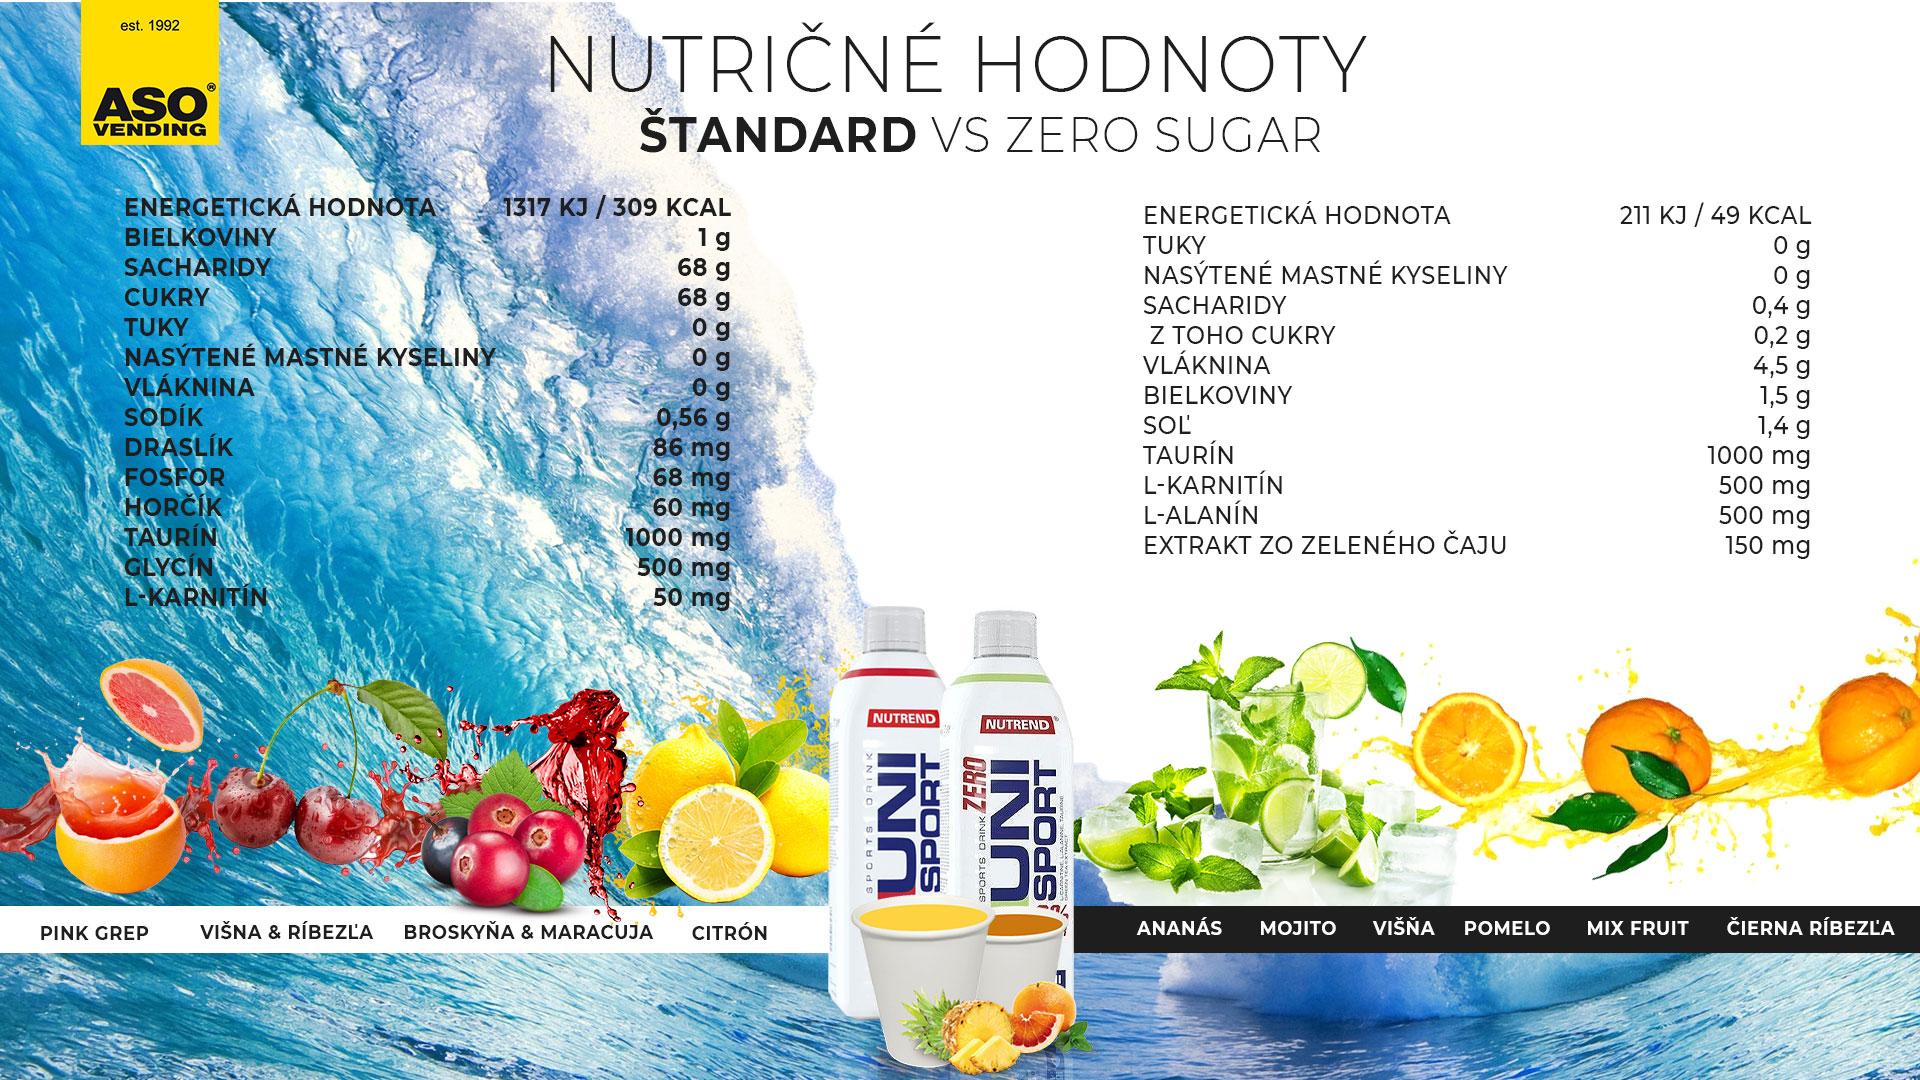 nutricne hodnoty hypotonickych napojov v isomate aso vending